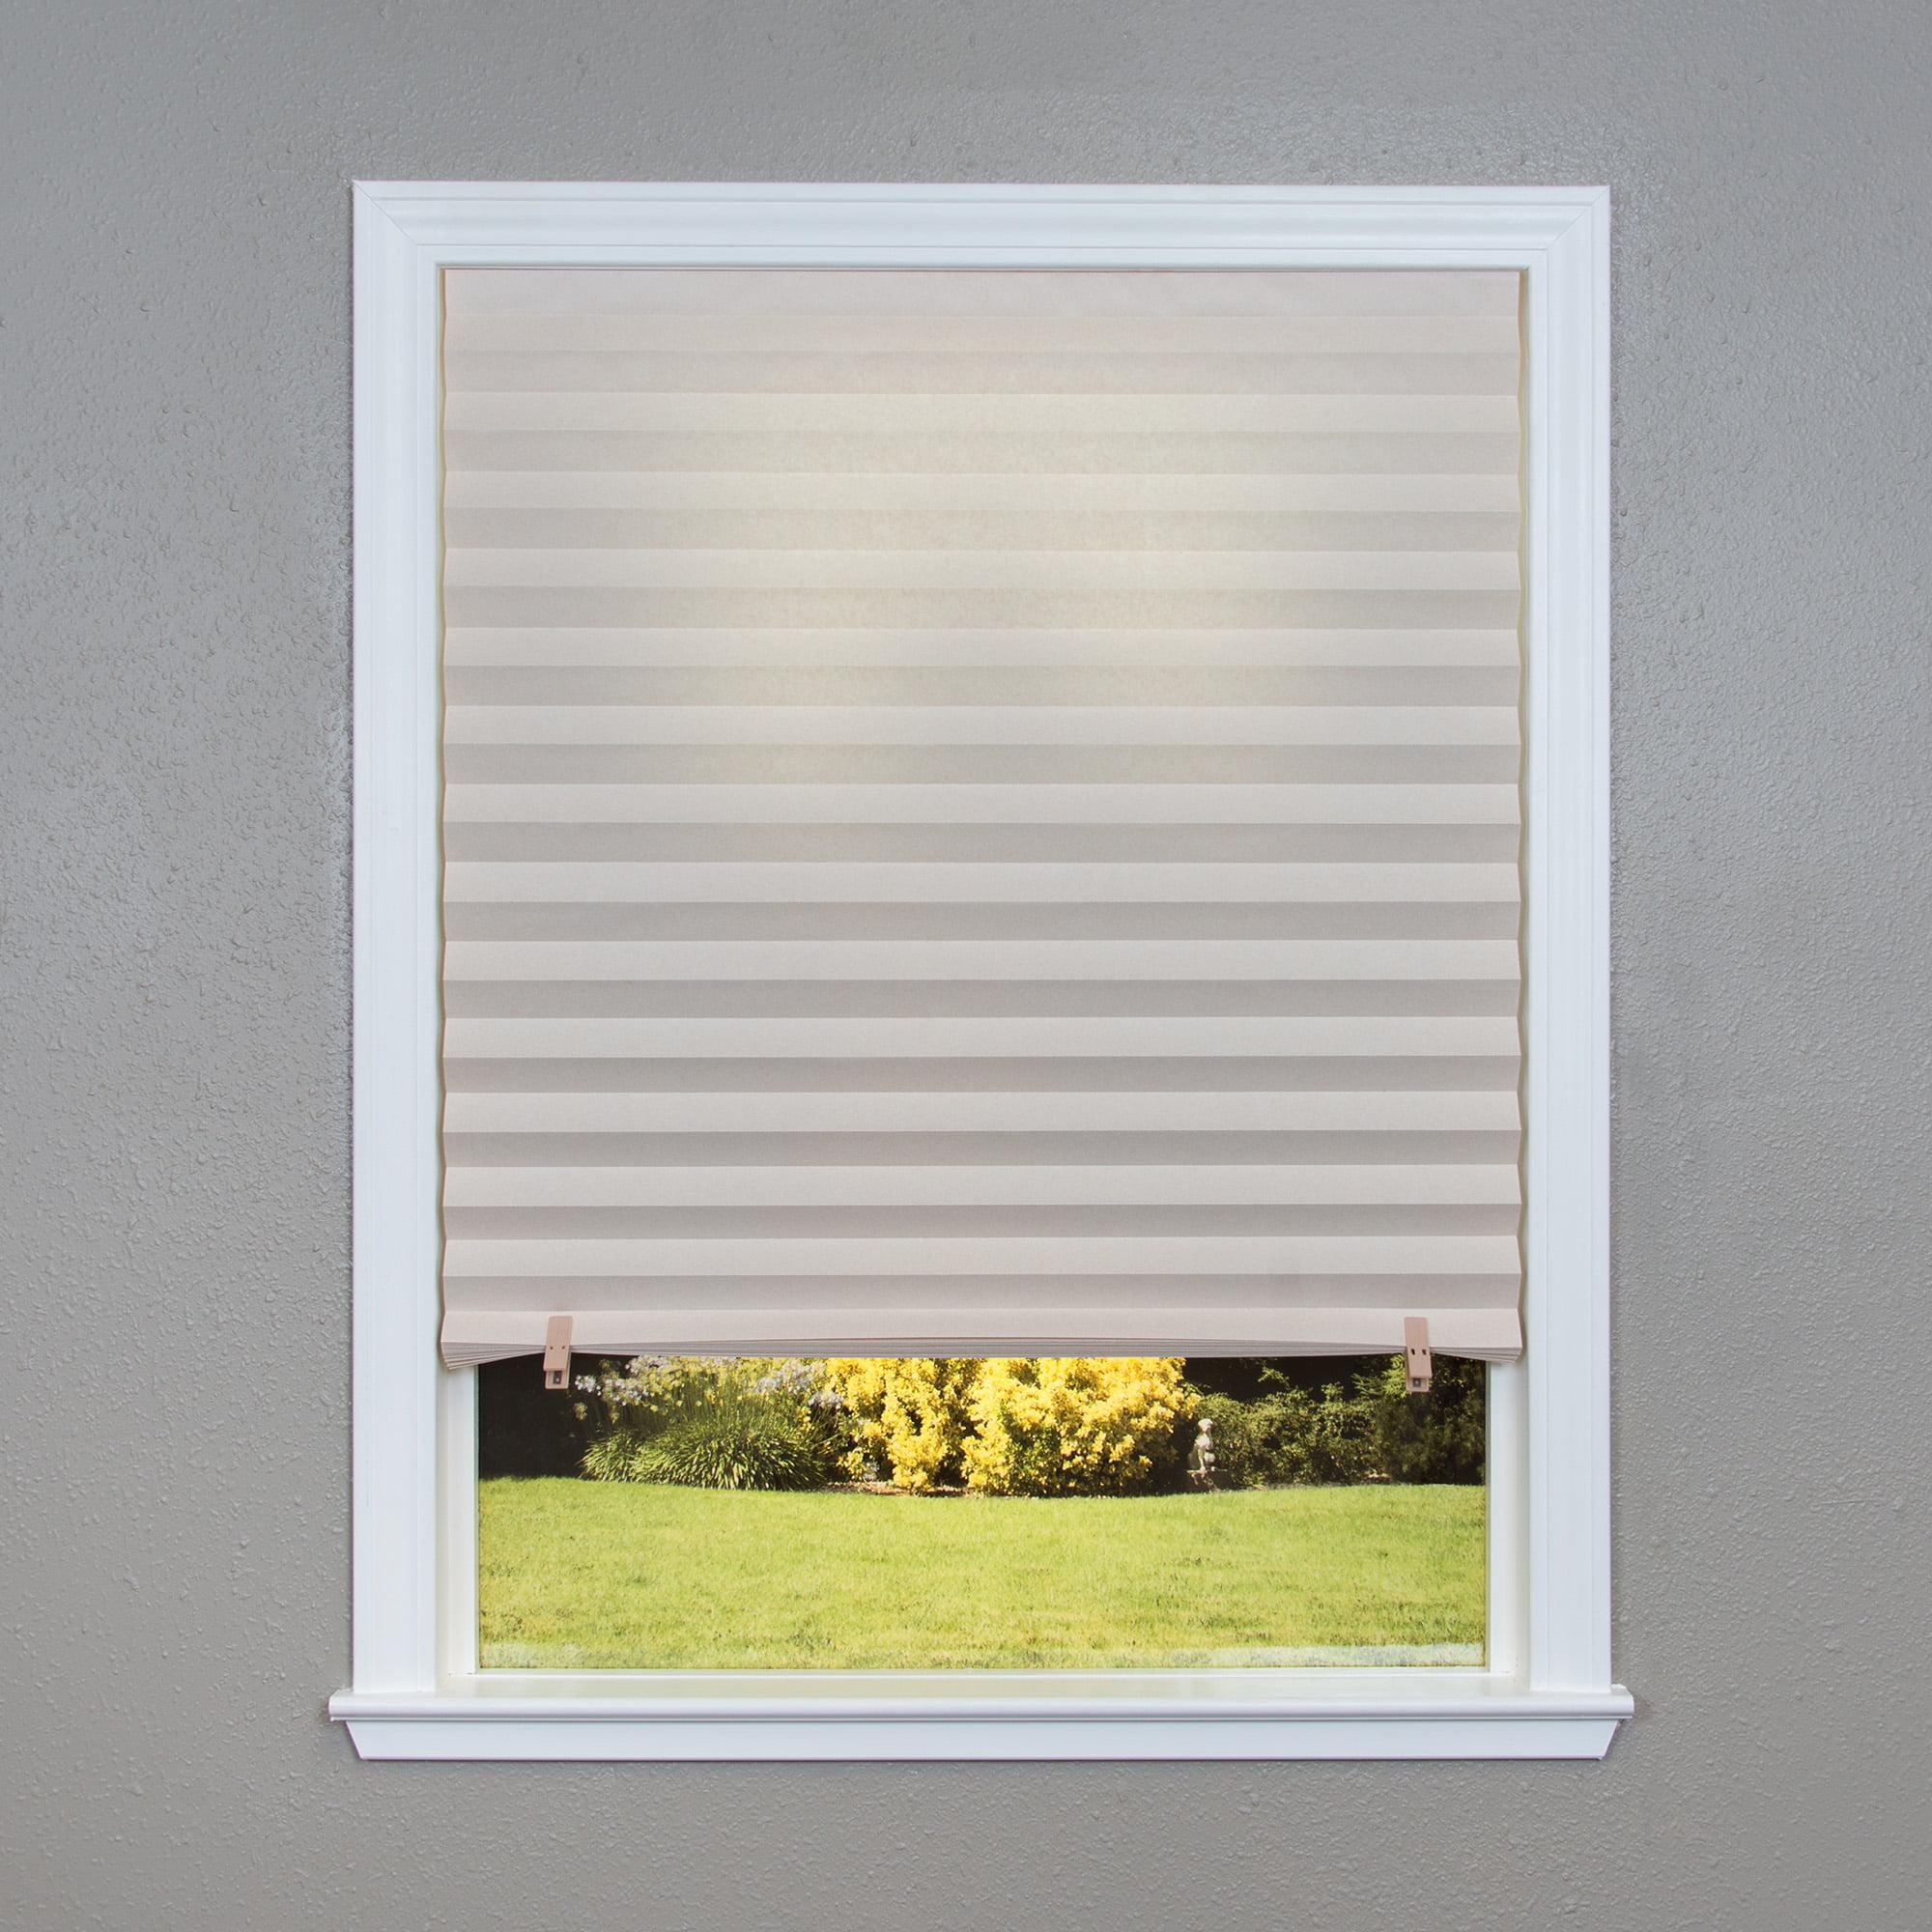 Original Light Filtering Pleated Paper Shade 6 Pack Walmart Com Walmart Com